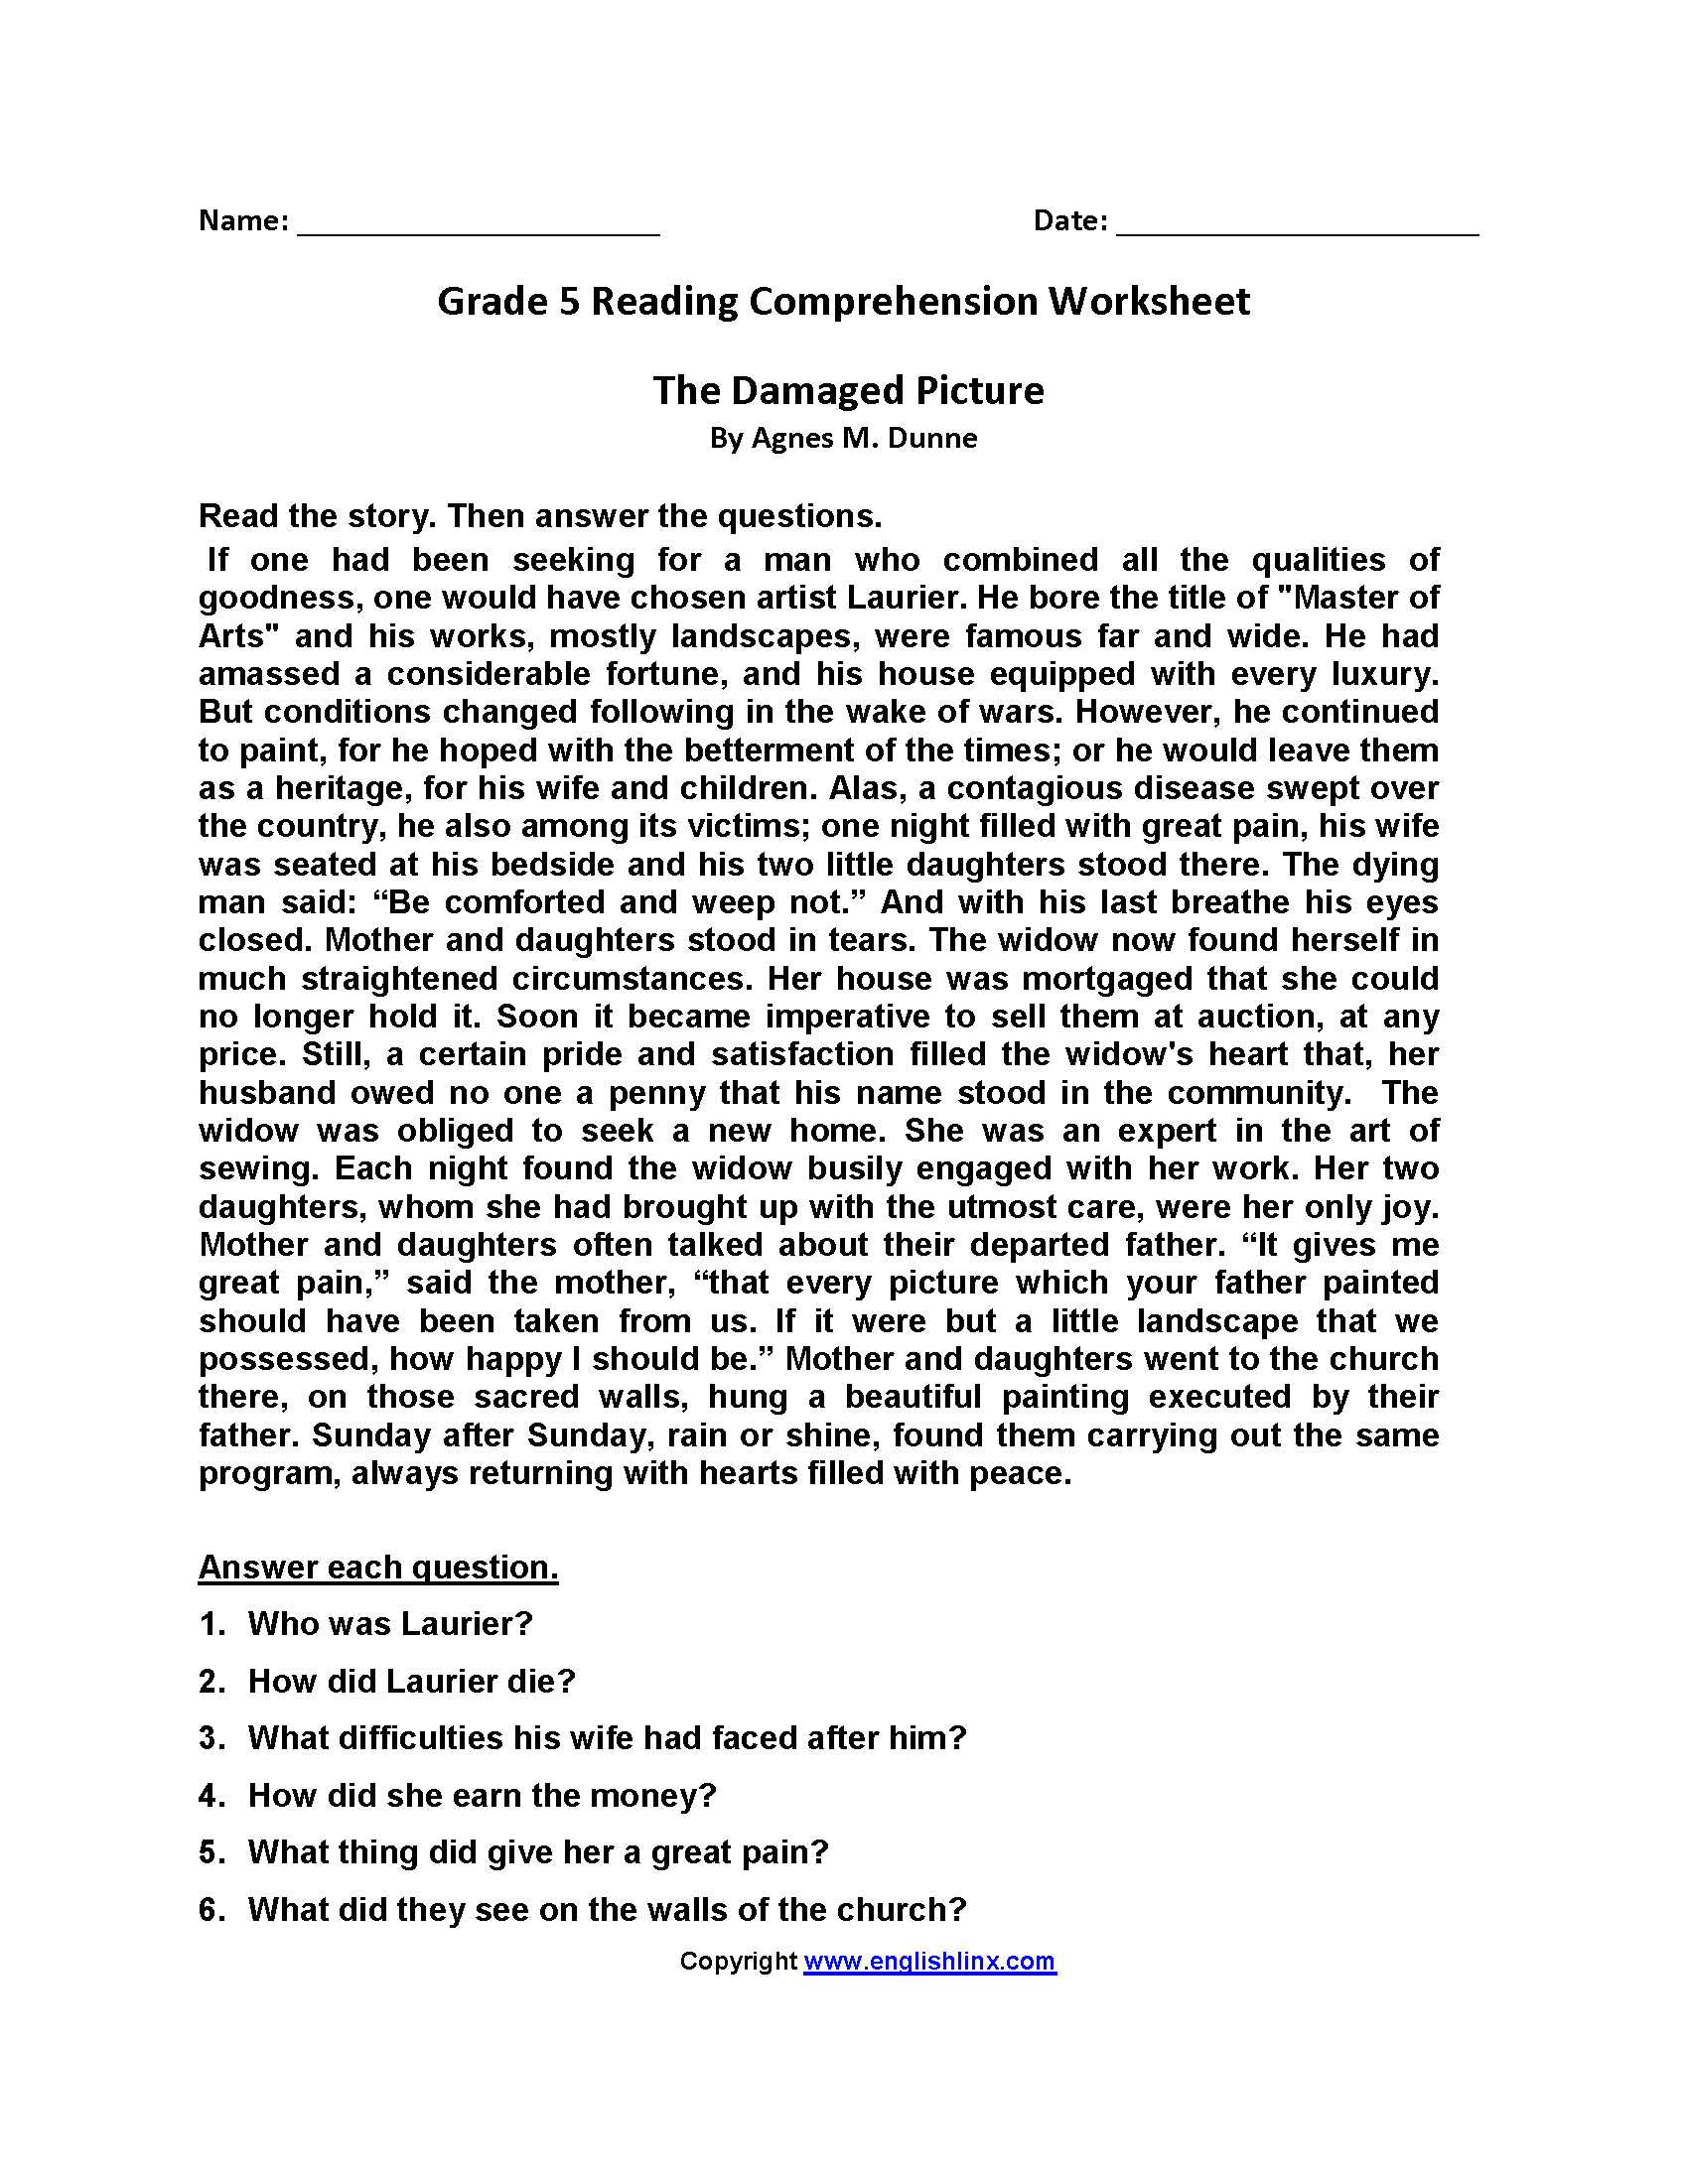 Damaged Picture Fifth Grade Reading Worksheets   Reading comprehension  worksheets [ 2200 x 1700 Pixel ]